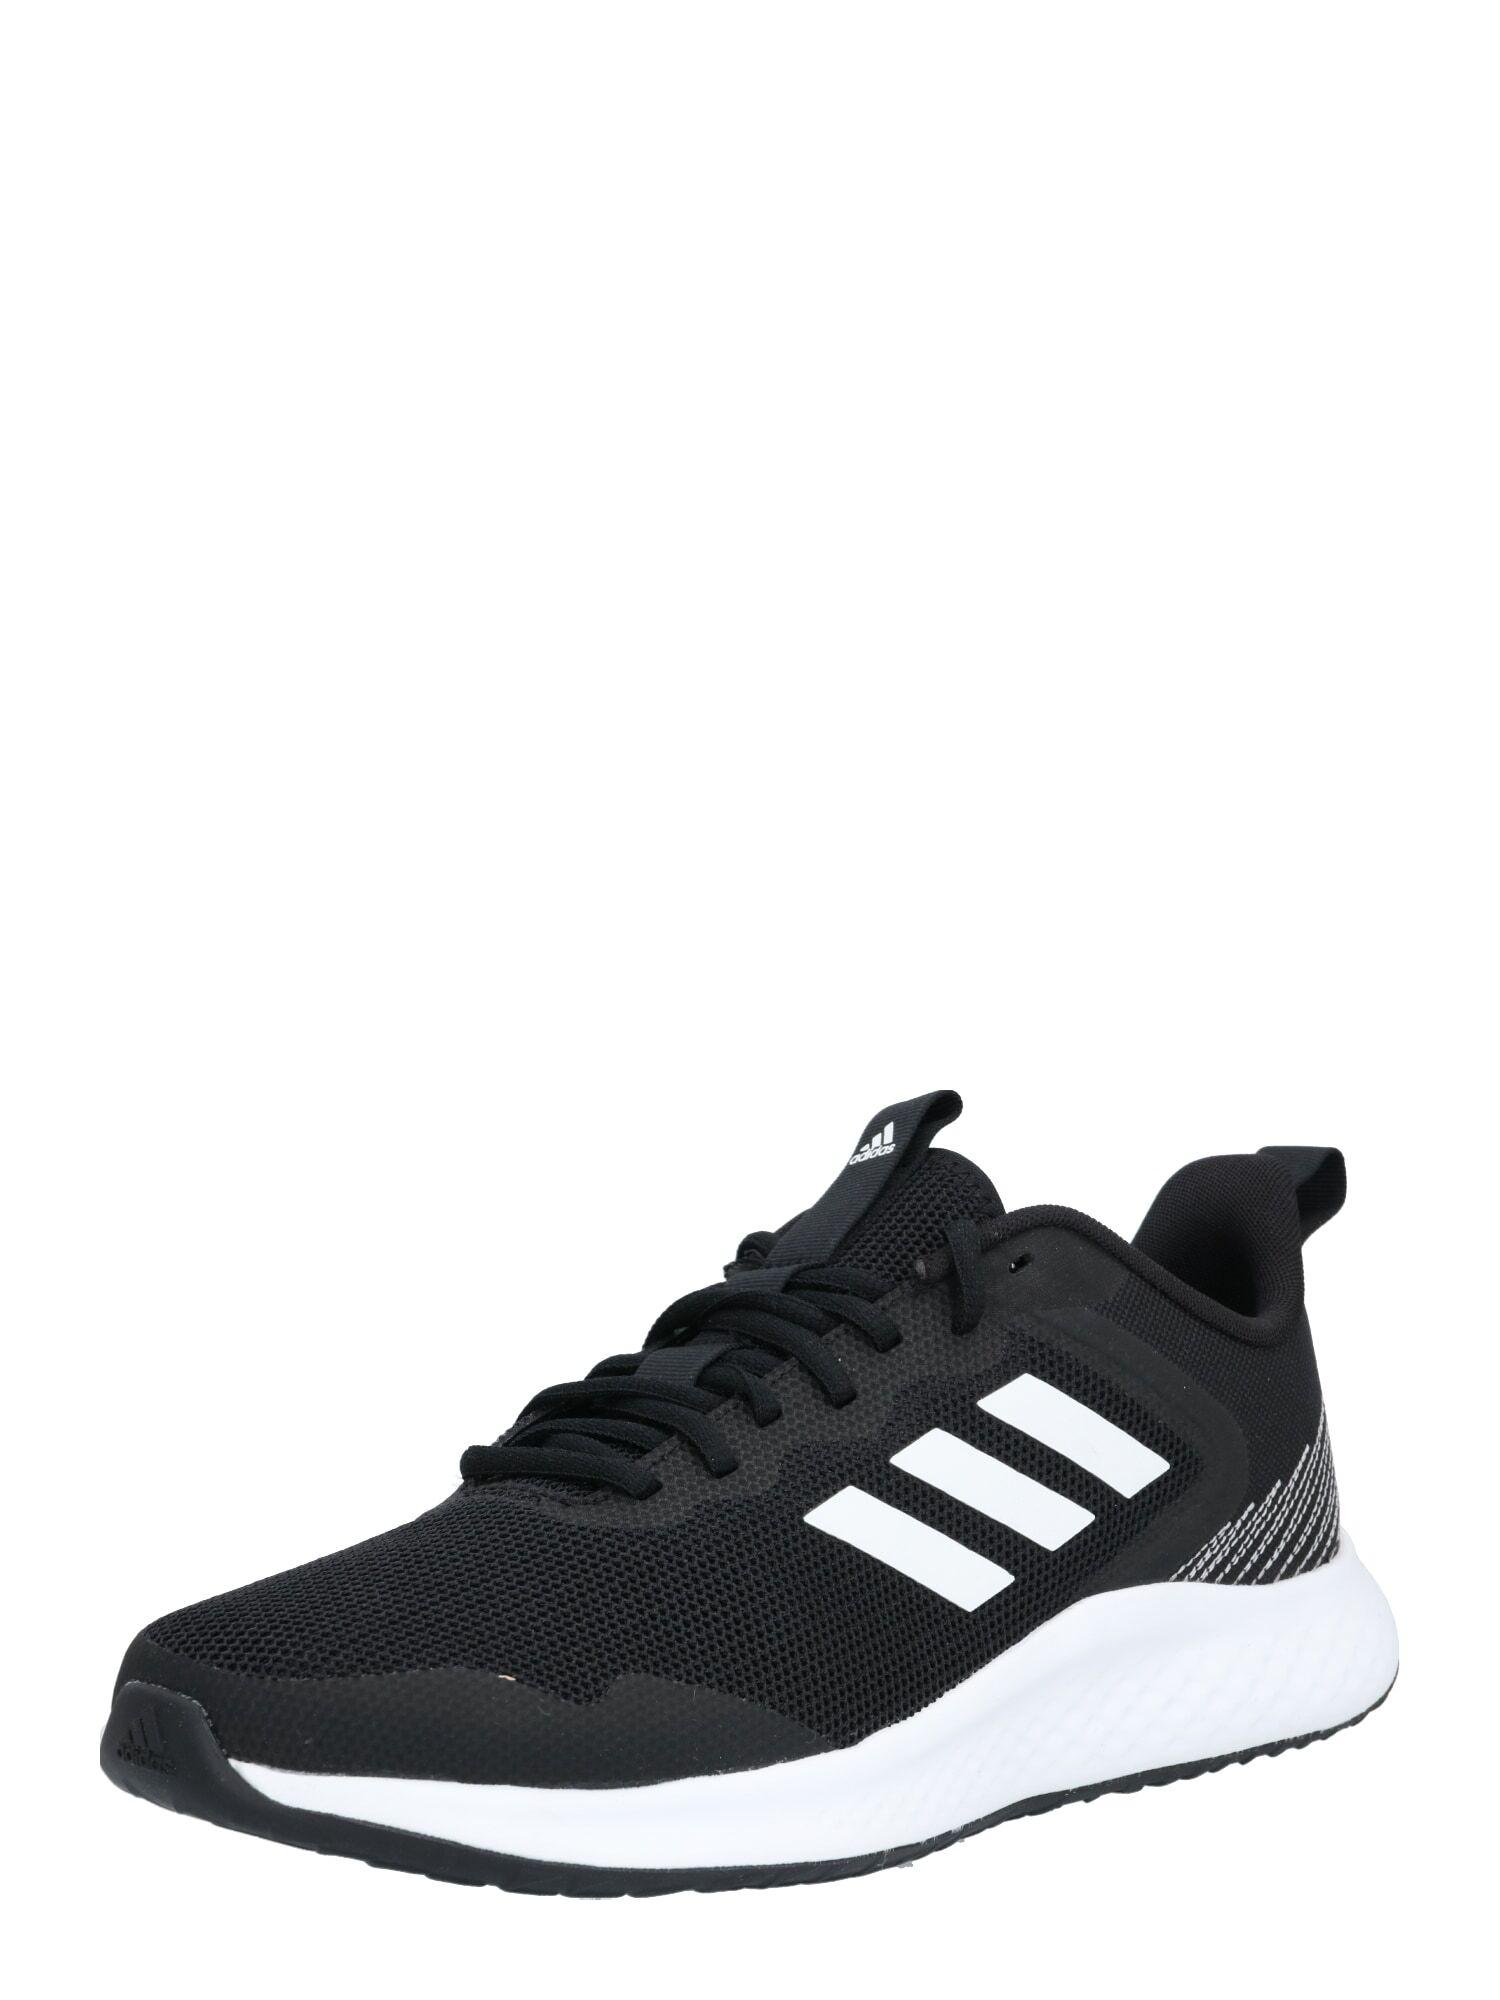 ADIDAS PERFORMANCE Chaussure de course 'Fluid Street'  - Noir - Taille: 6.5 - male